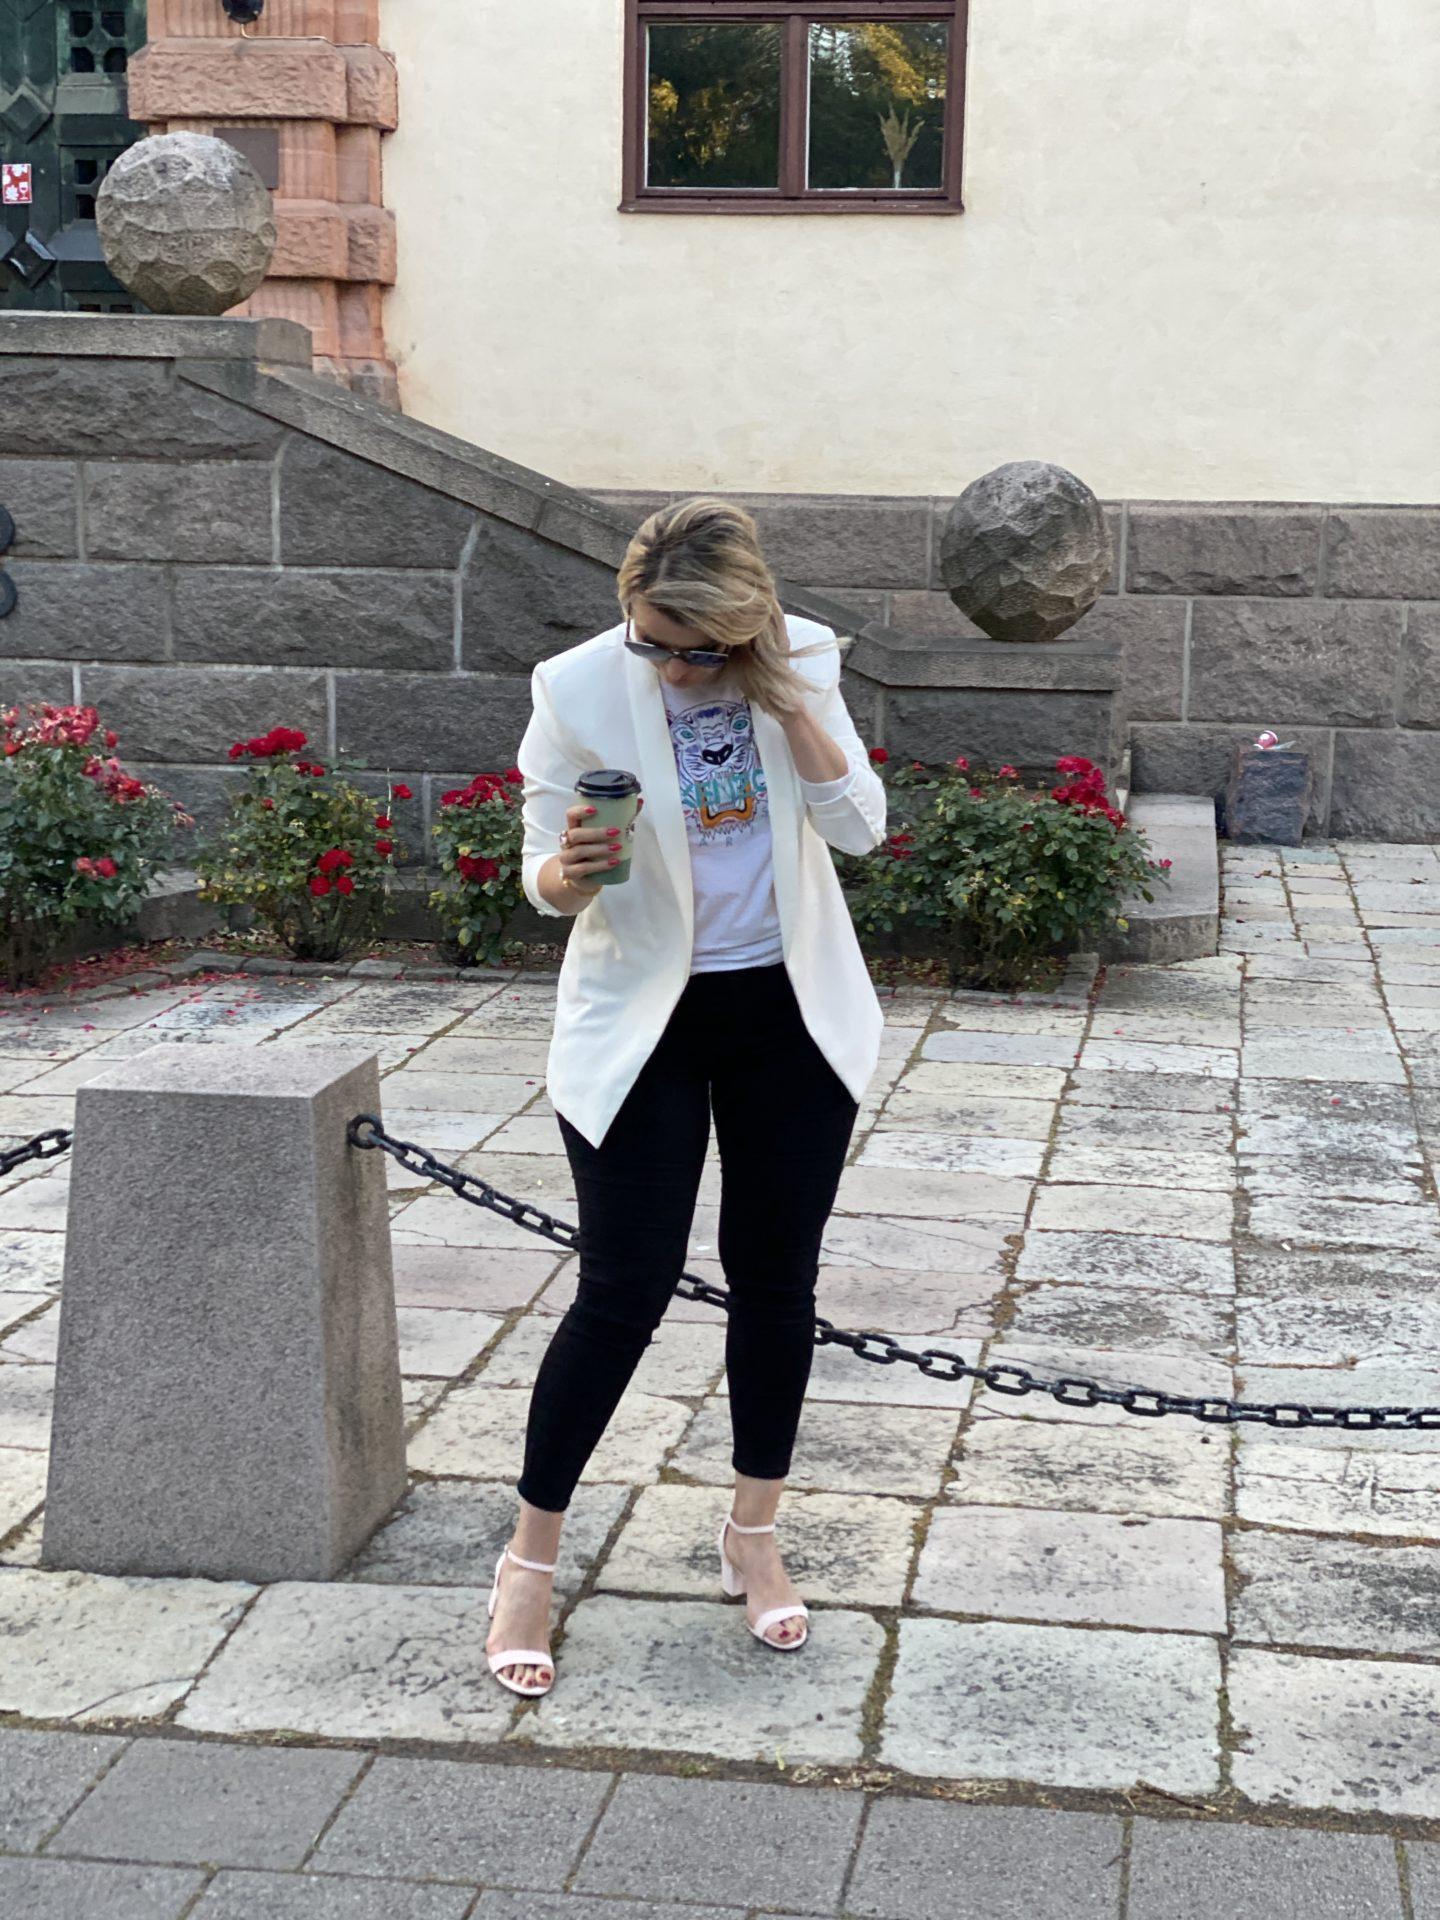 Sköna jeans under 400:- 